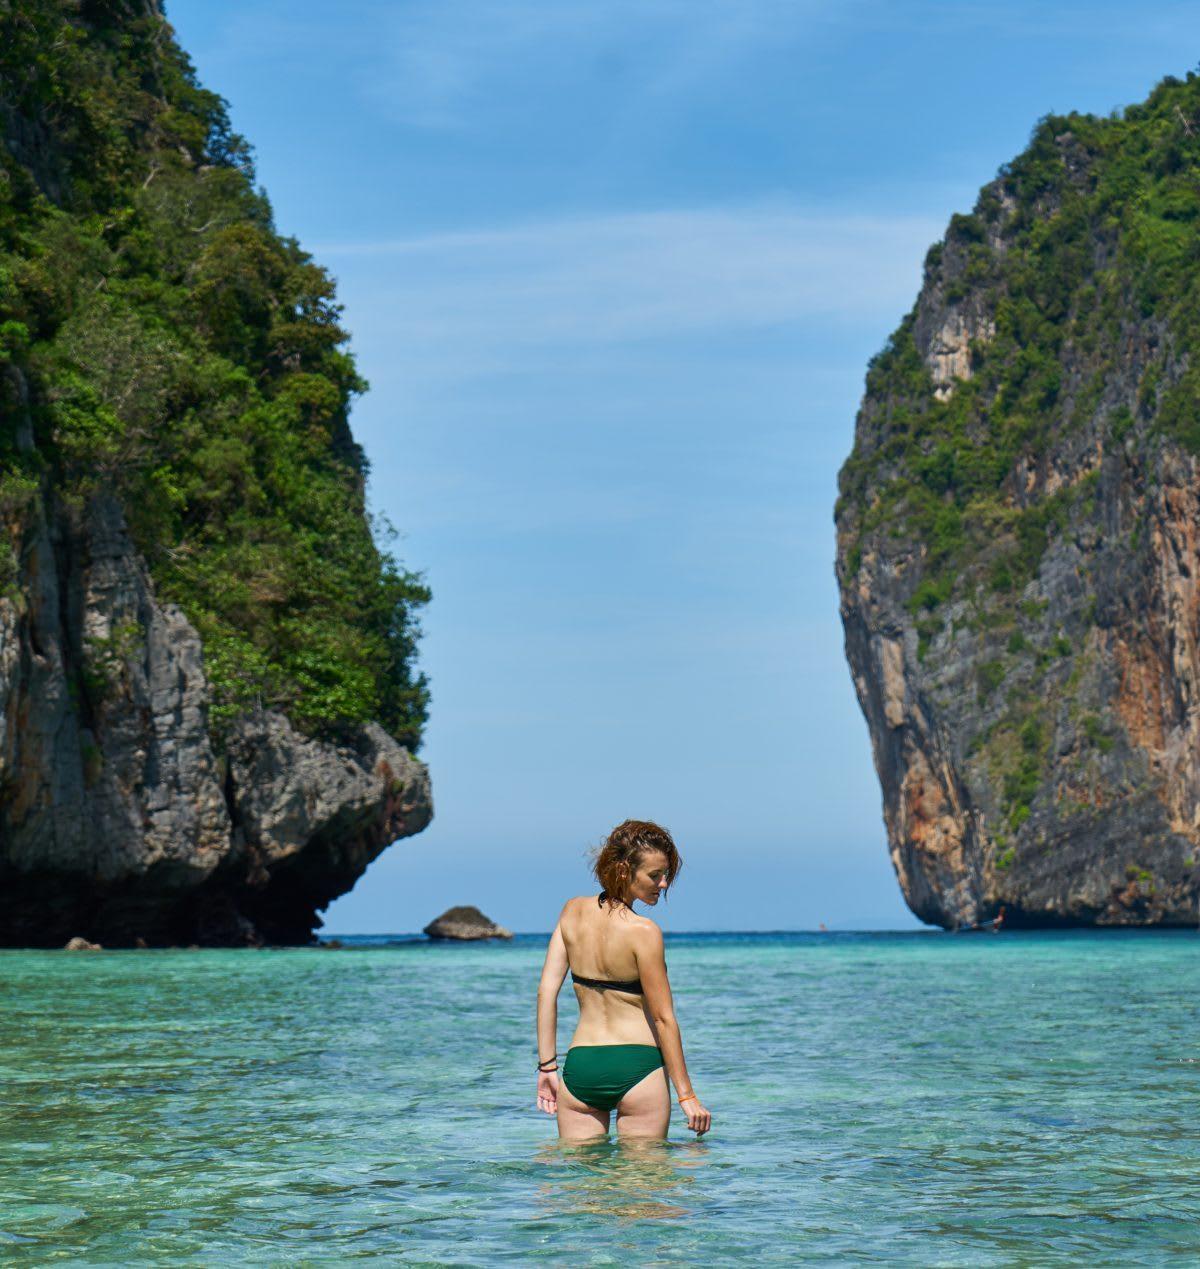 Women near Islands in Thailand